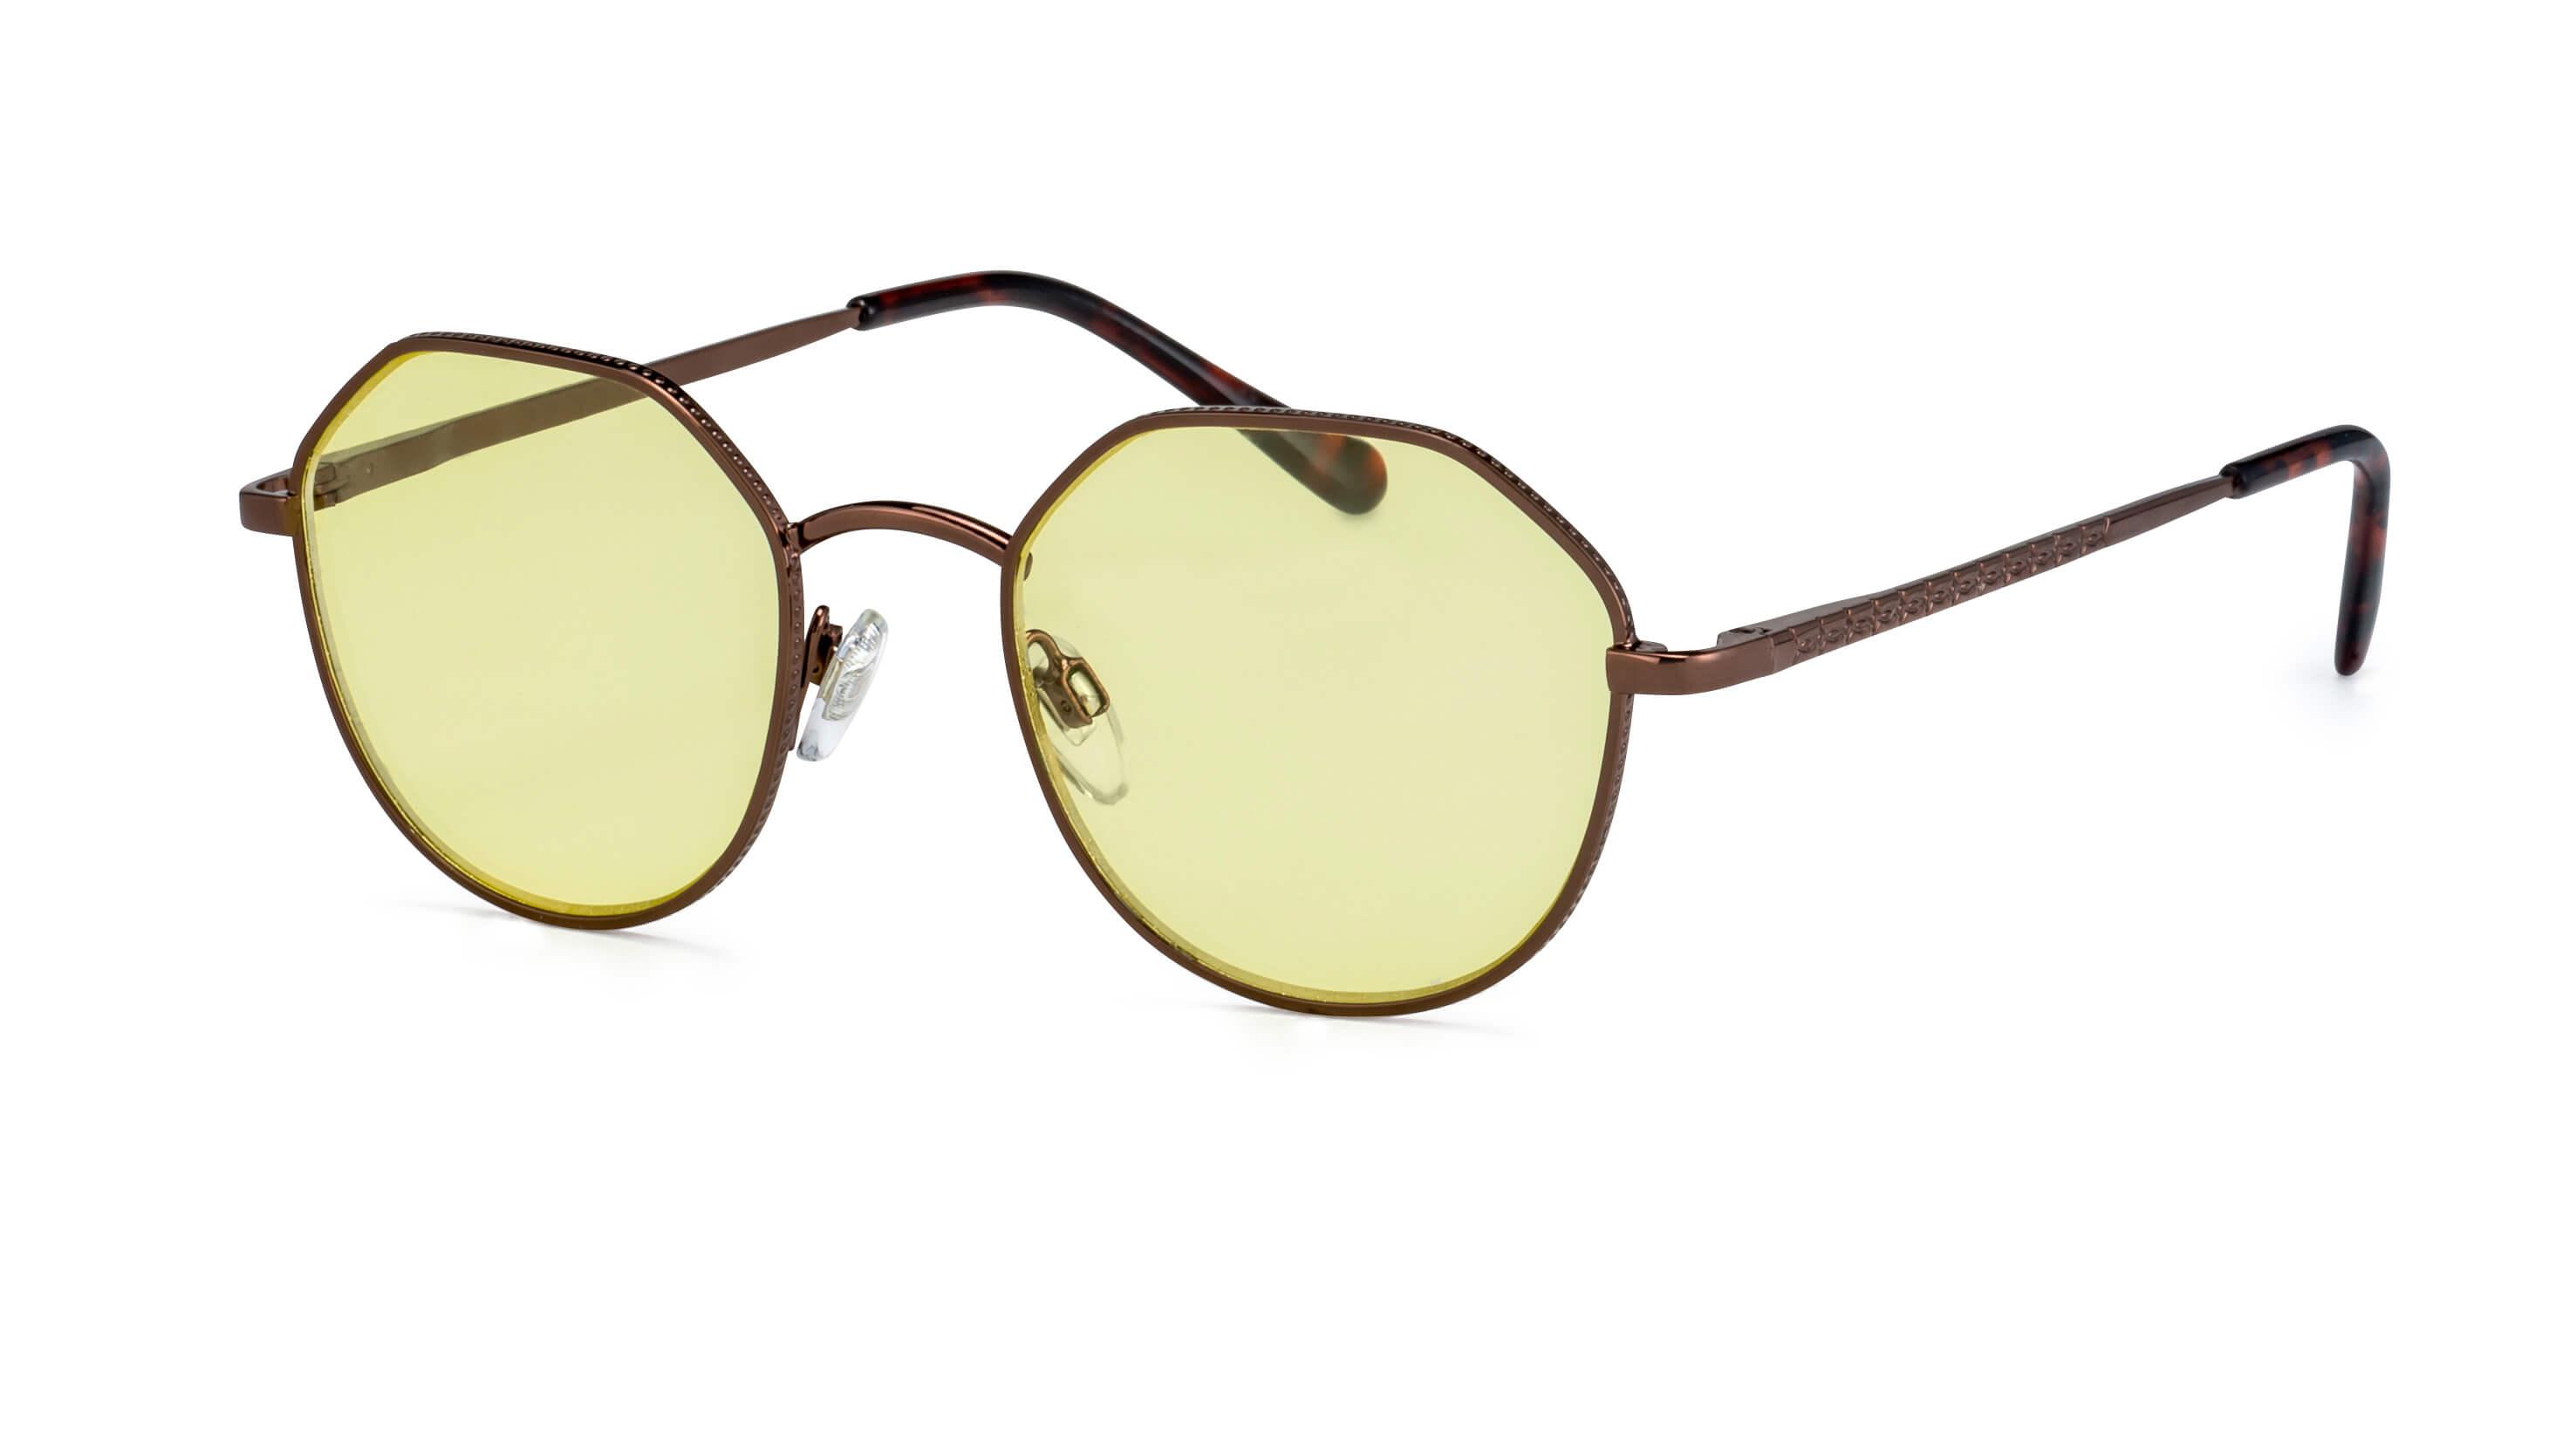 Main view sunglasses F3001040